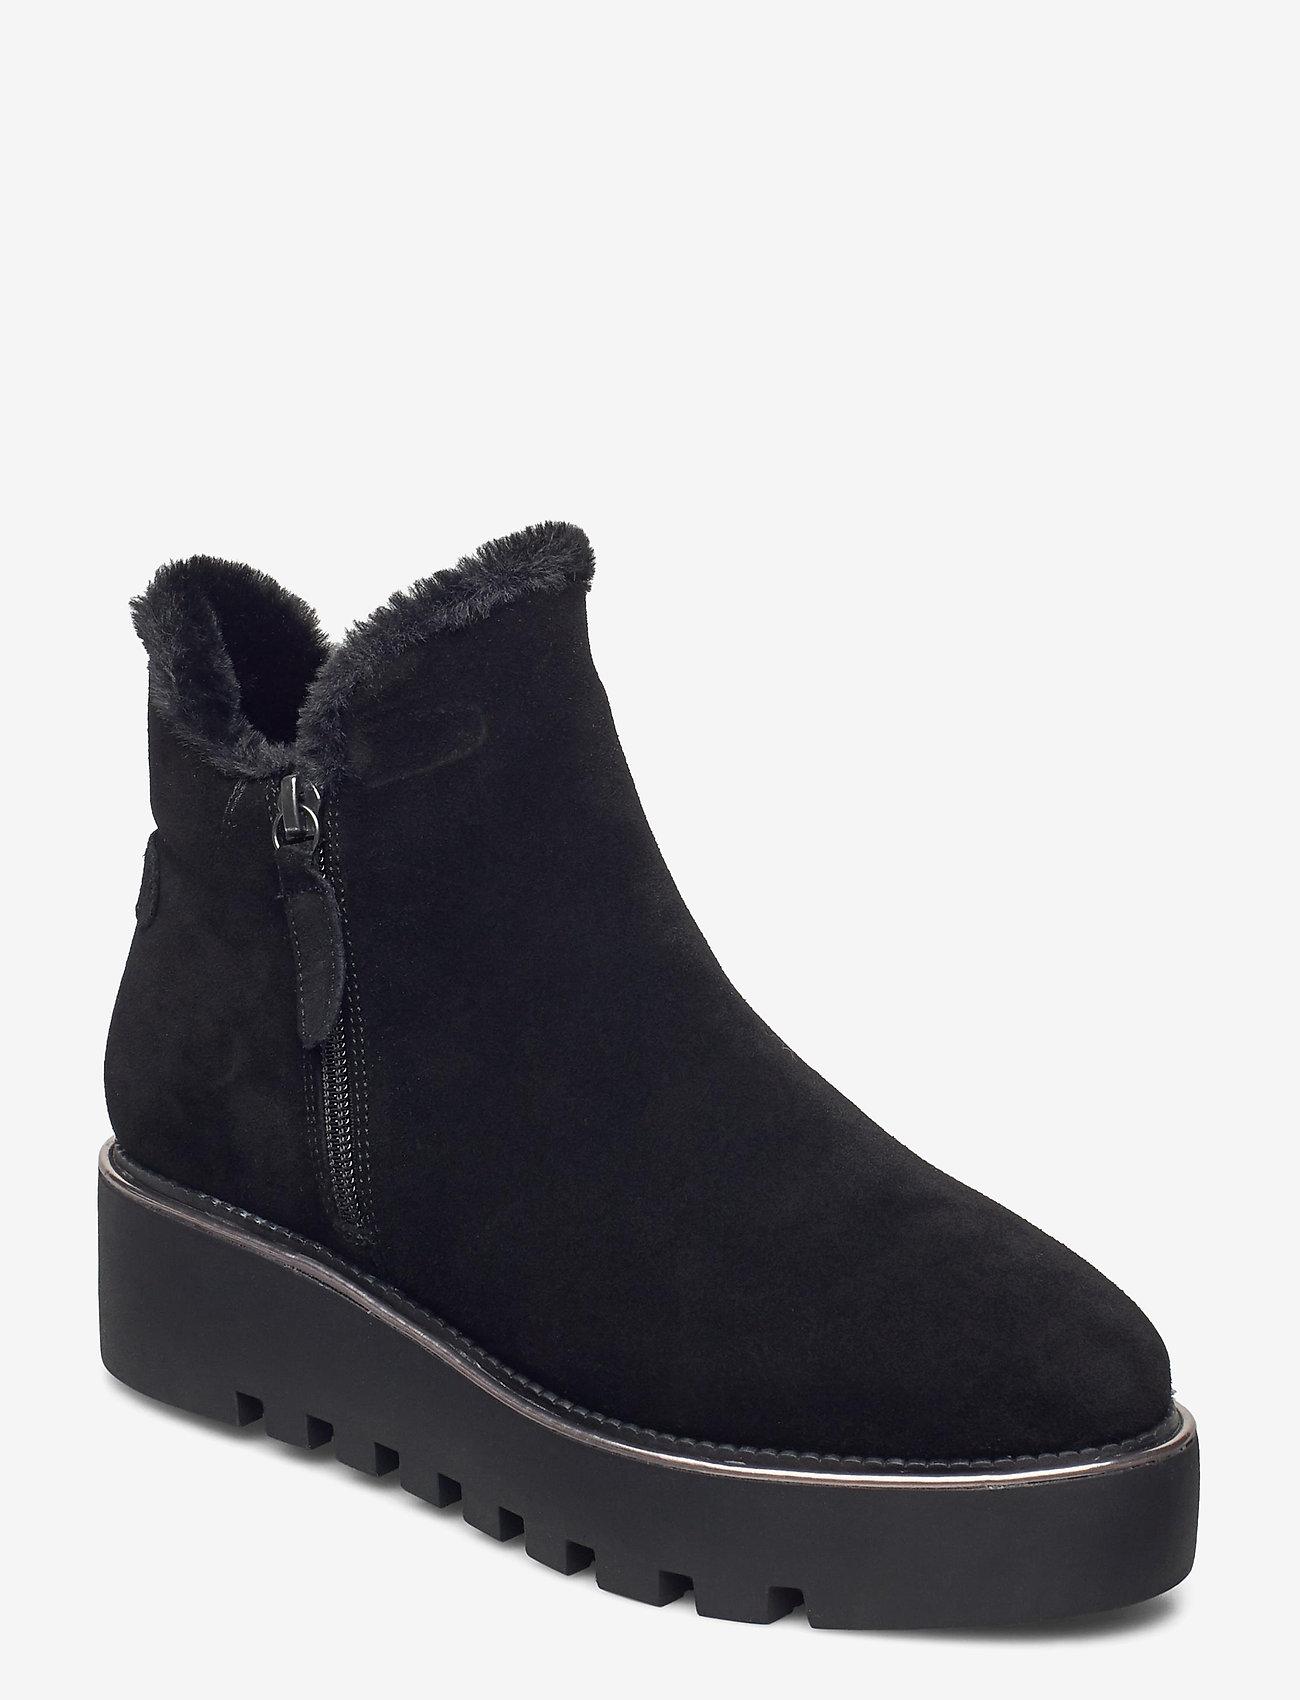 Tamaris - Woms Boots - black - 1